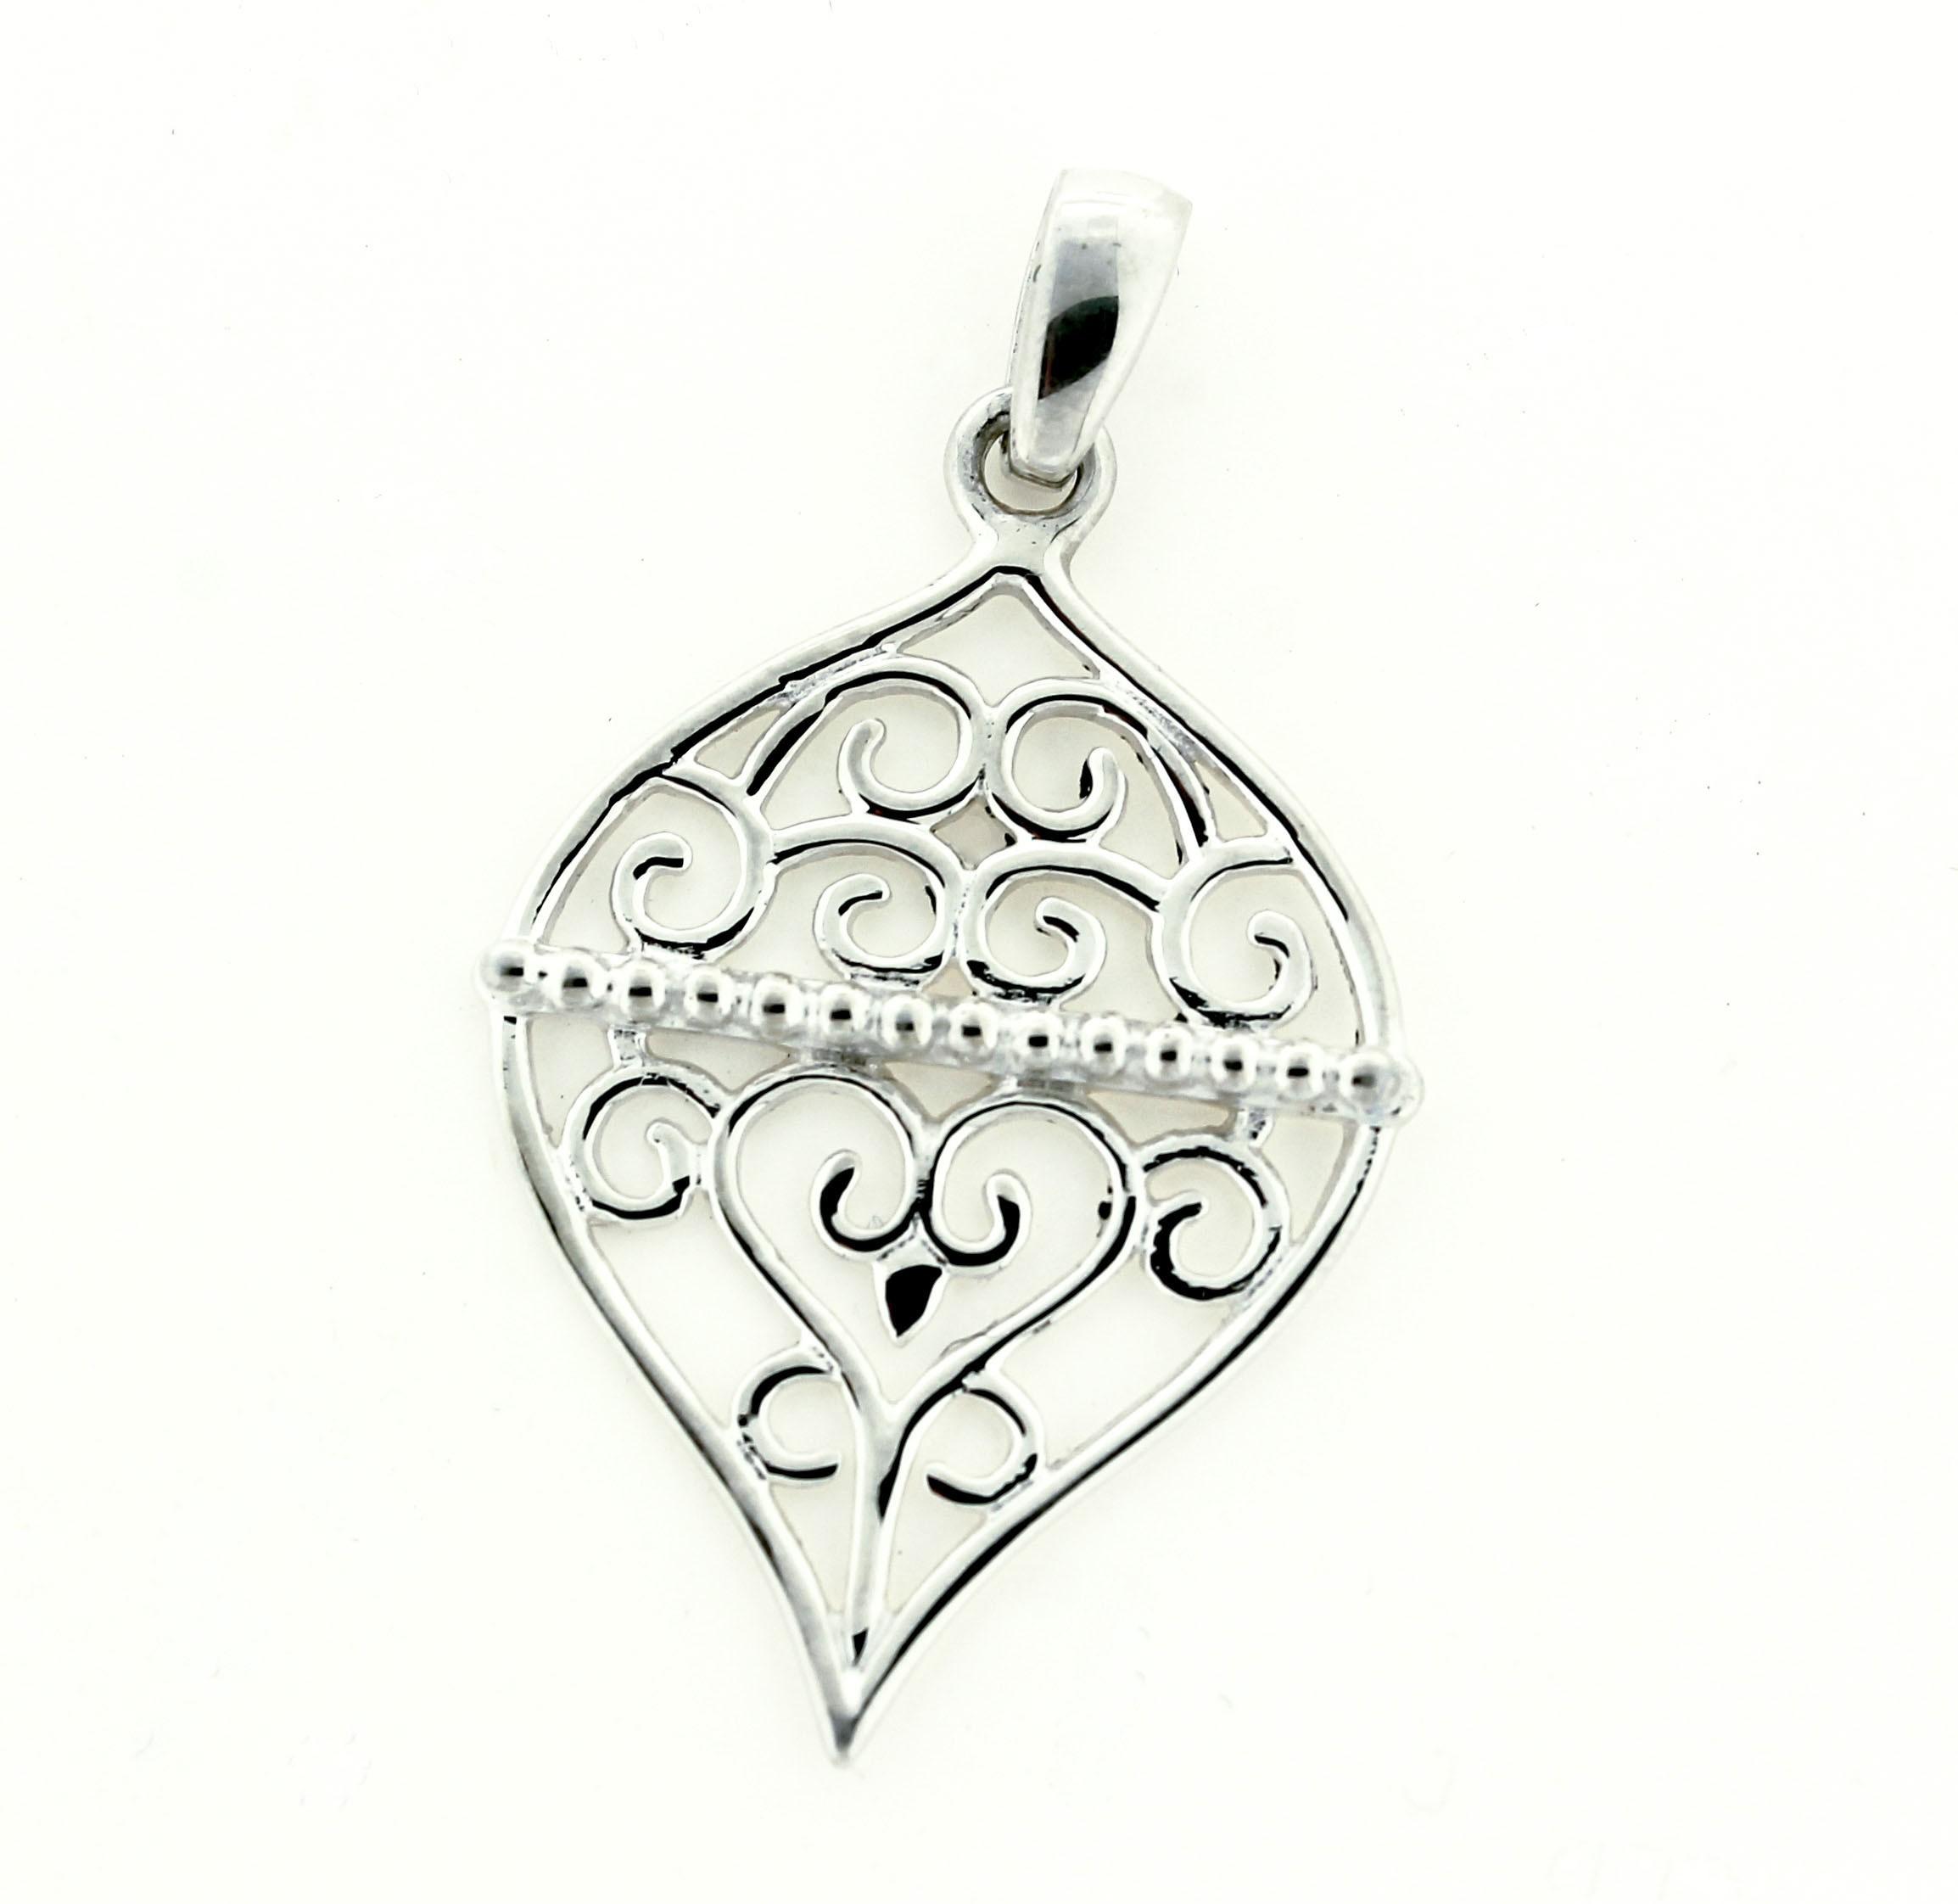 Southern Gates® Filigree Ornament Pendant